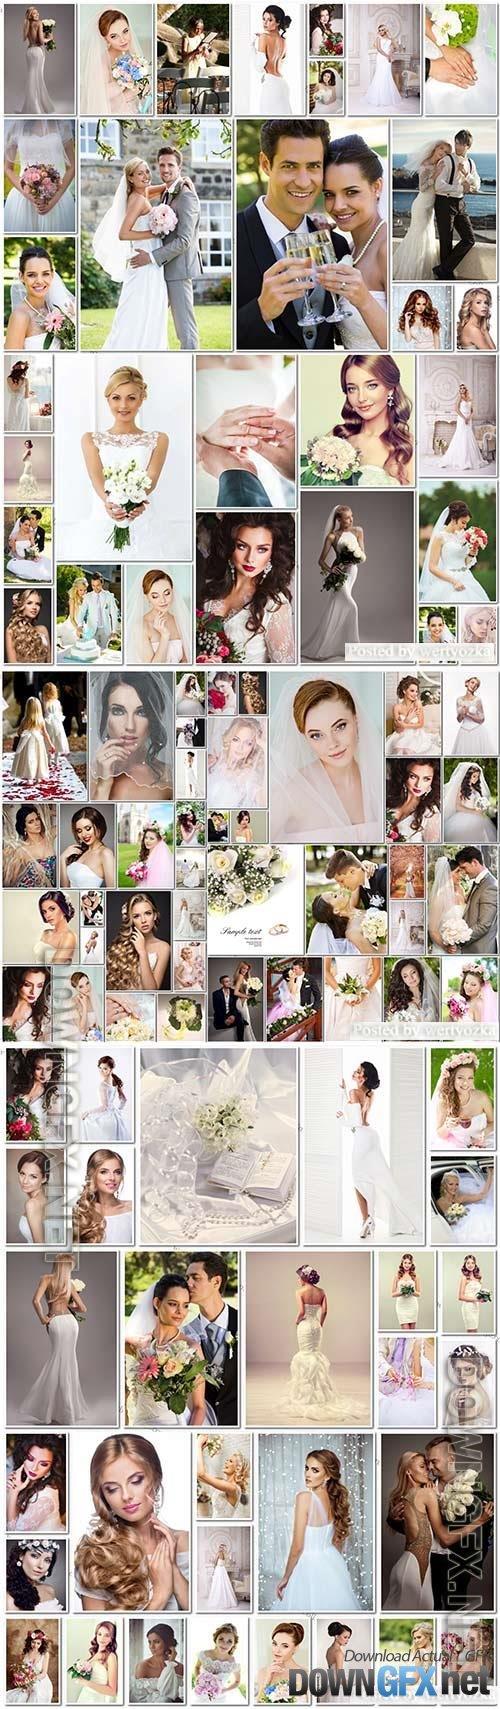 100 Bundle beautiful bride and groom, wedding stock photo vol 2